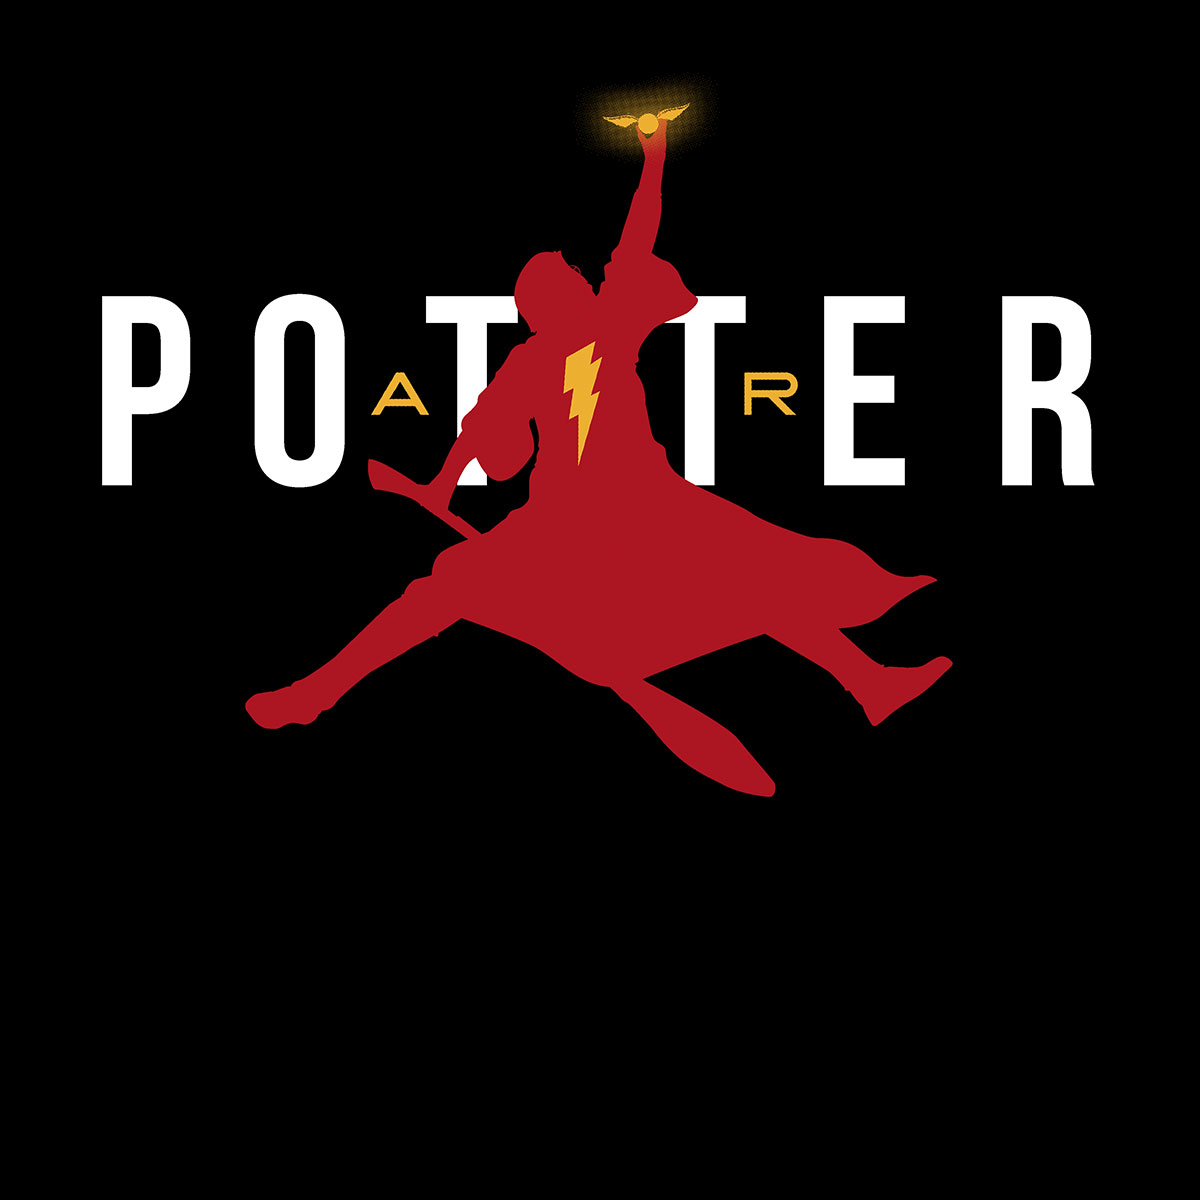 Air Potter. Shirtpunch, Pop culture shirts, Daily tees